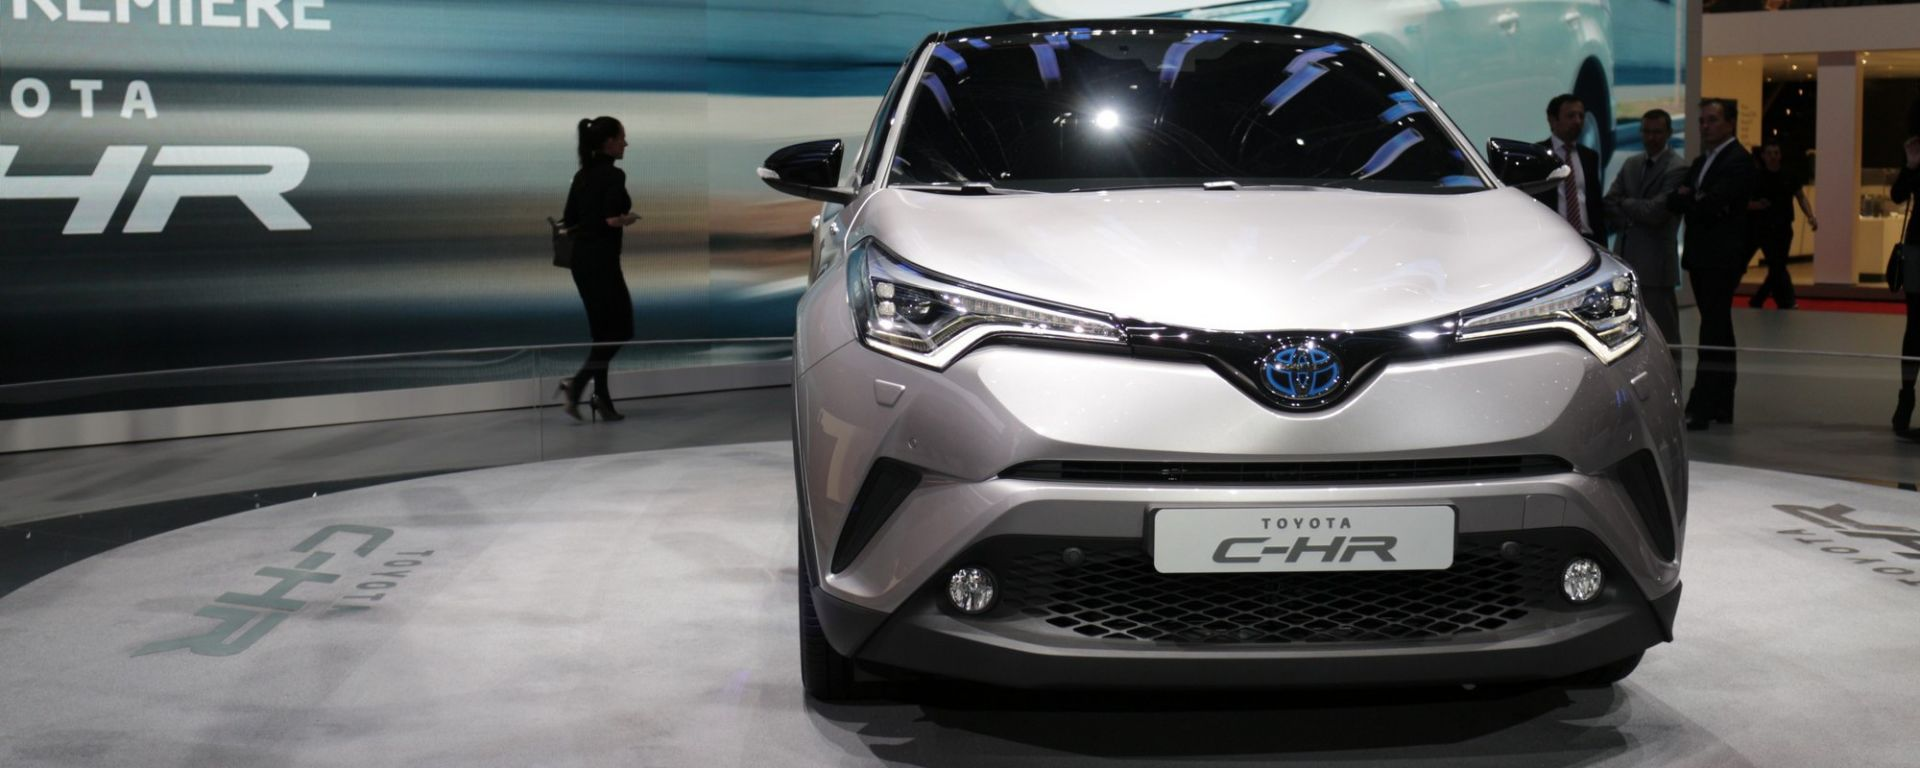 Ginevra 2016 - Notizie dalle Case: Toyota